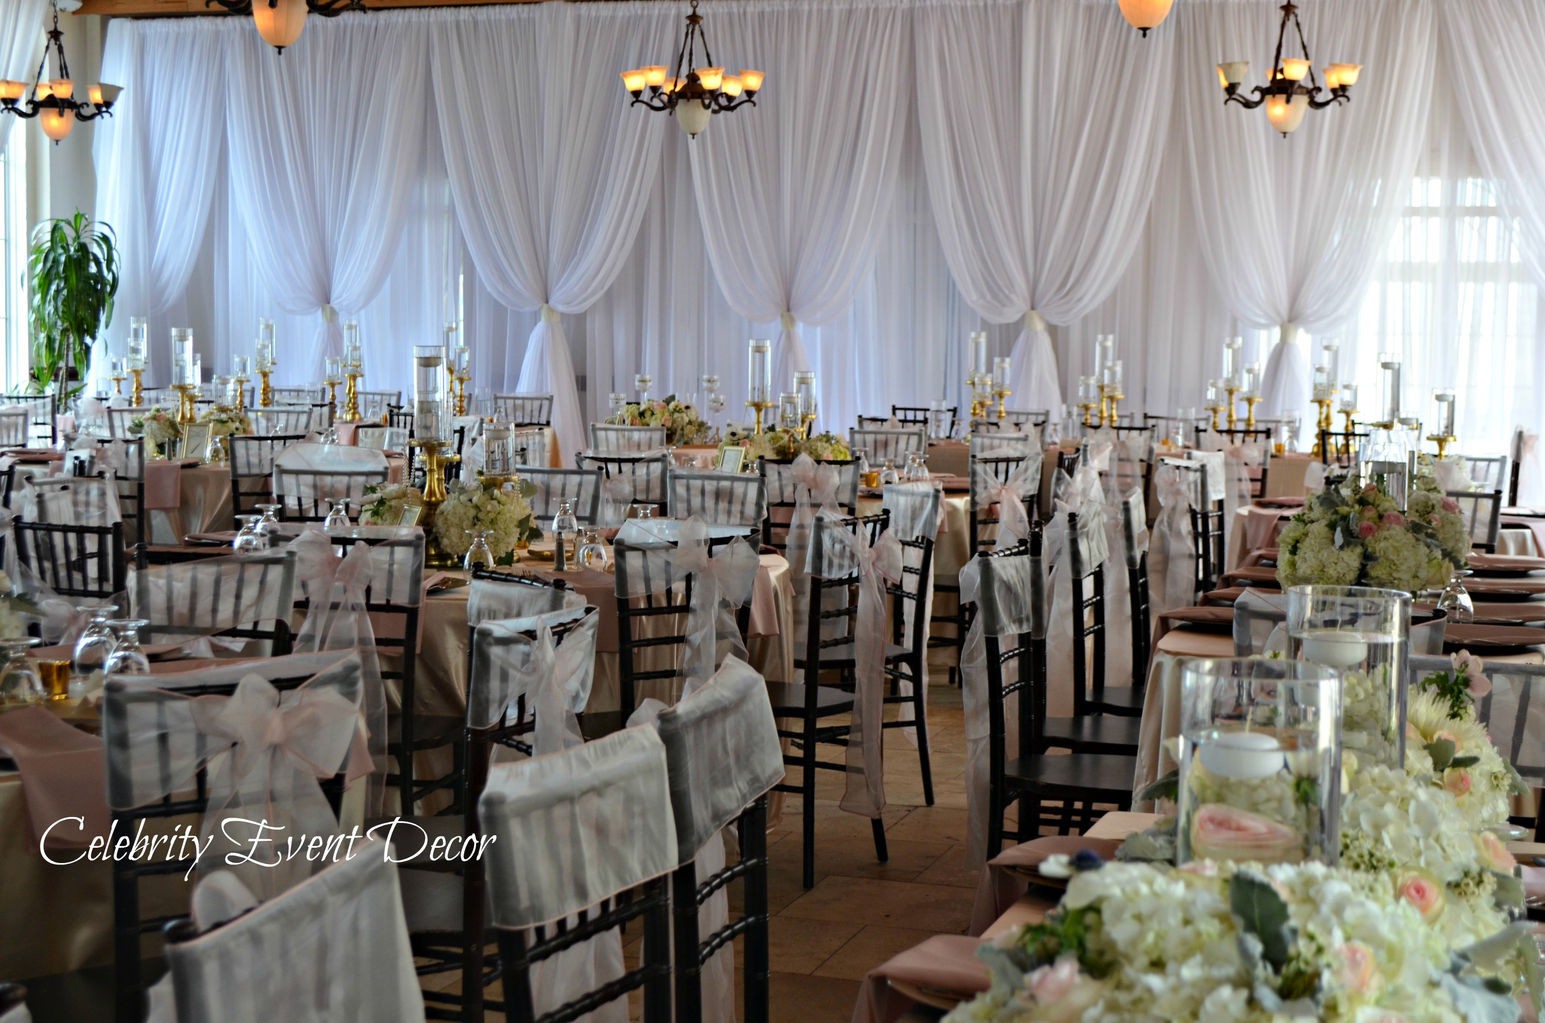 Celebrity event decor banquet hall jacksonville fl balloon 083g junglespirit Image collections